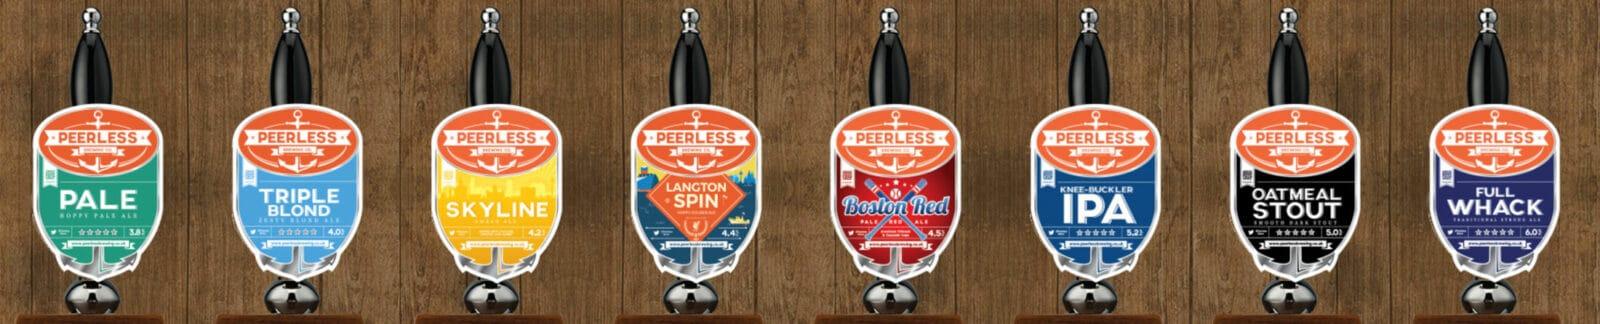 Peerless Brewing Company header